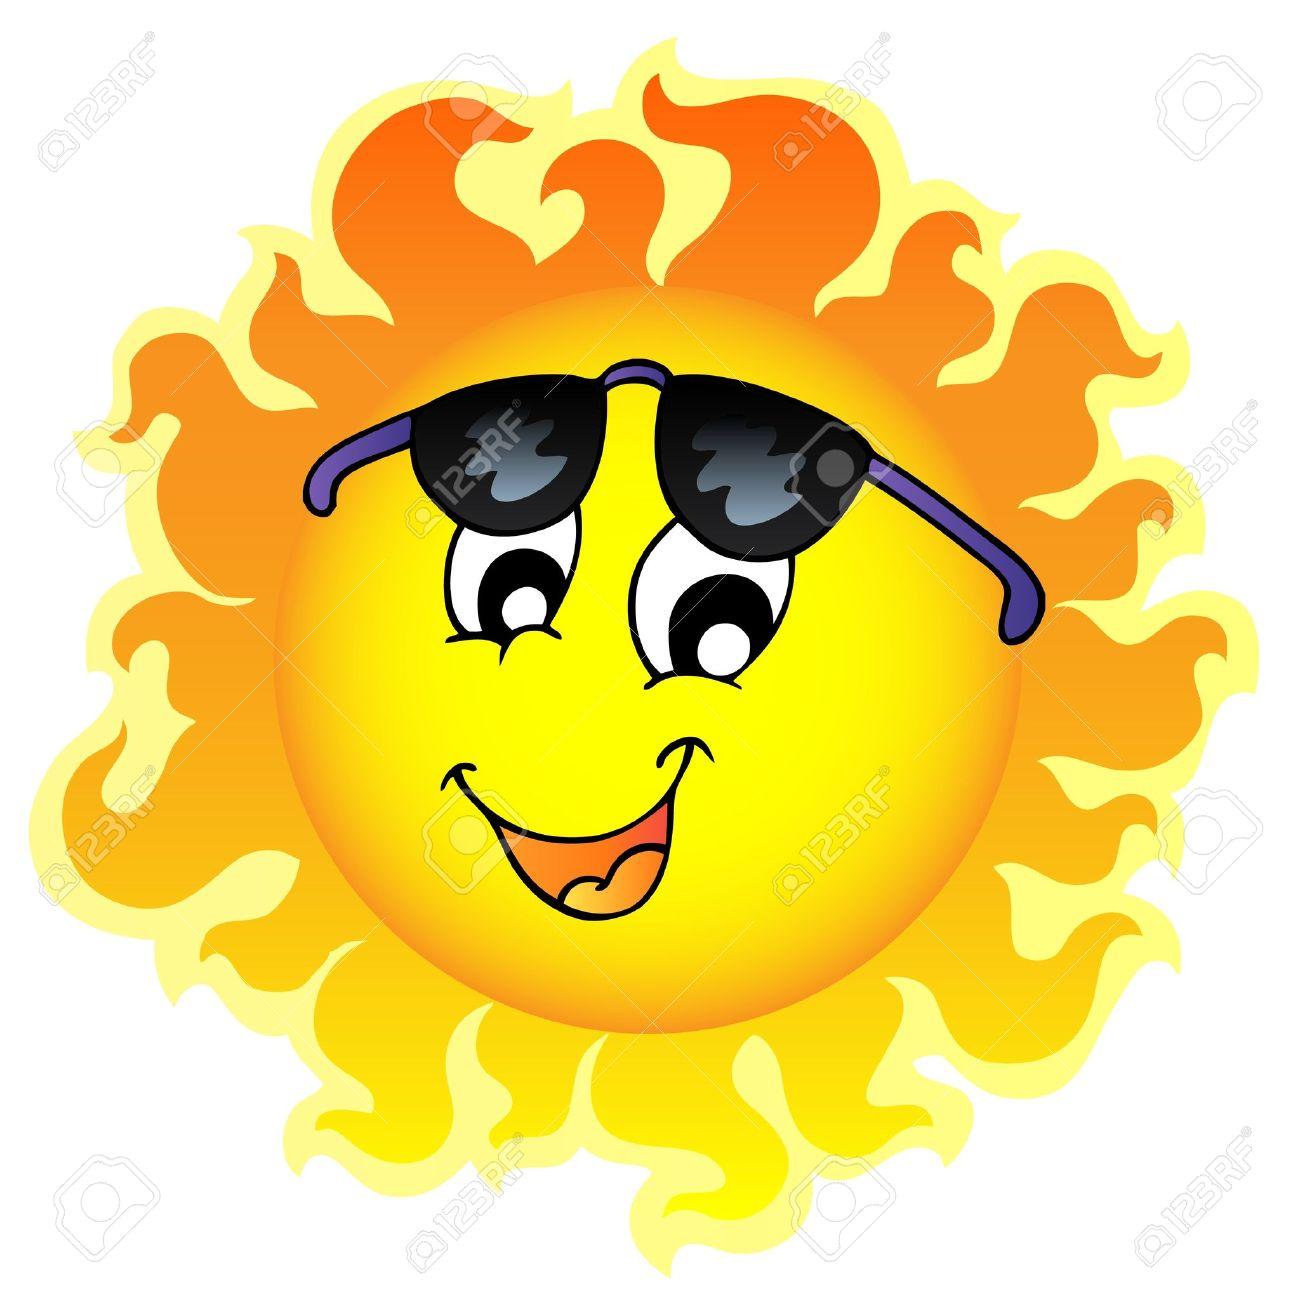 1300x1300 Clipart Sun, Suggestions For Clipart Sun, Download Clipart Sun